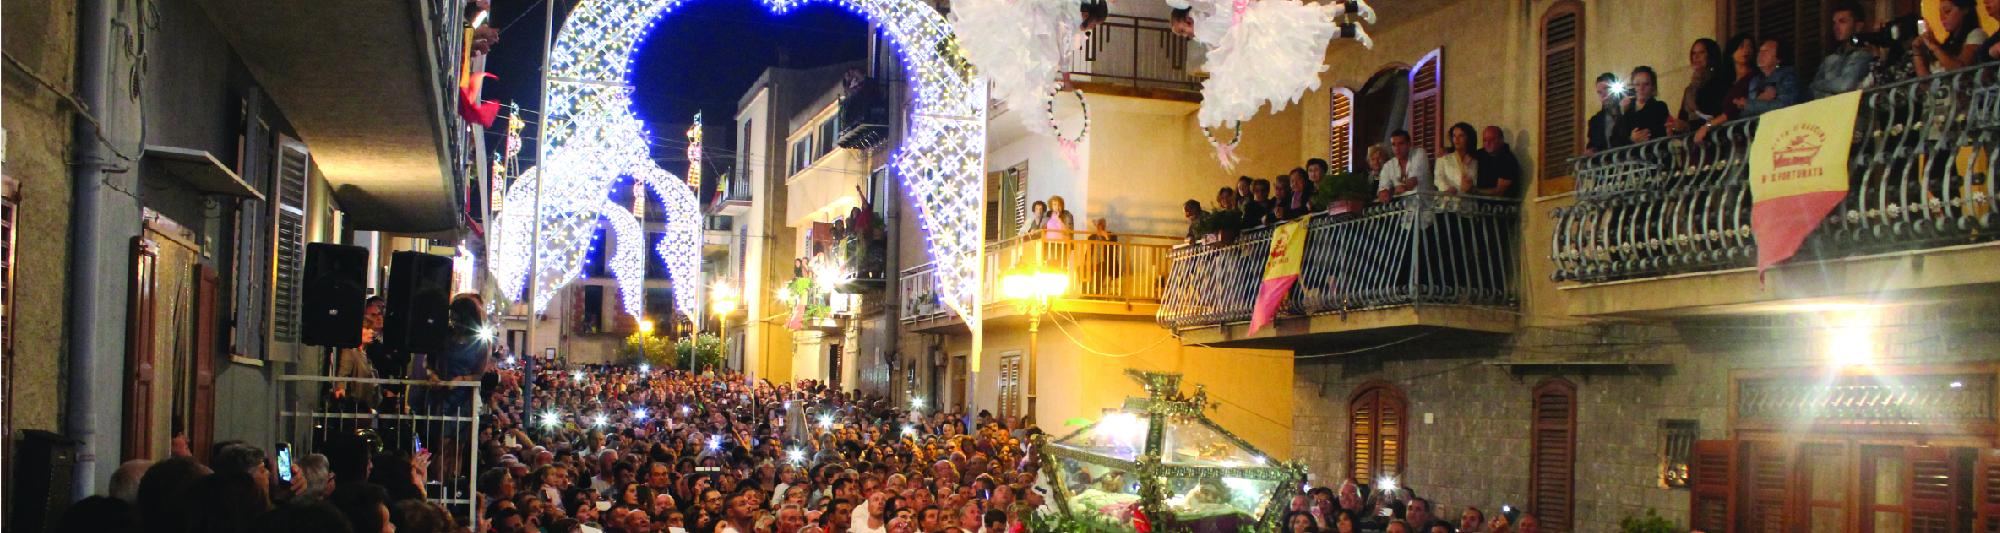 Festa di Santa Fortunata